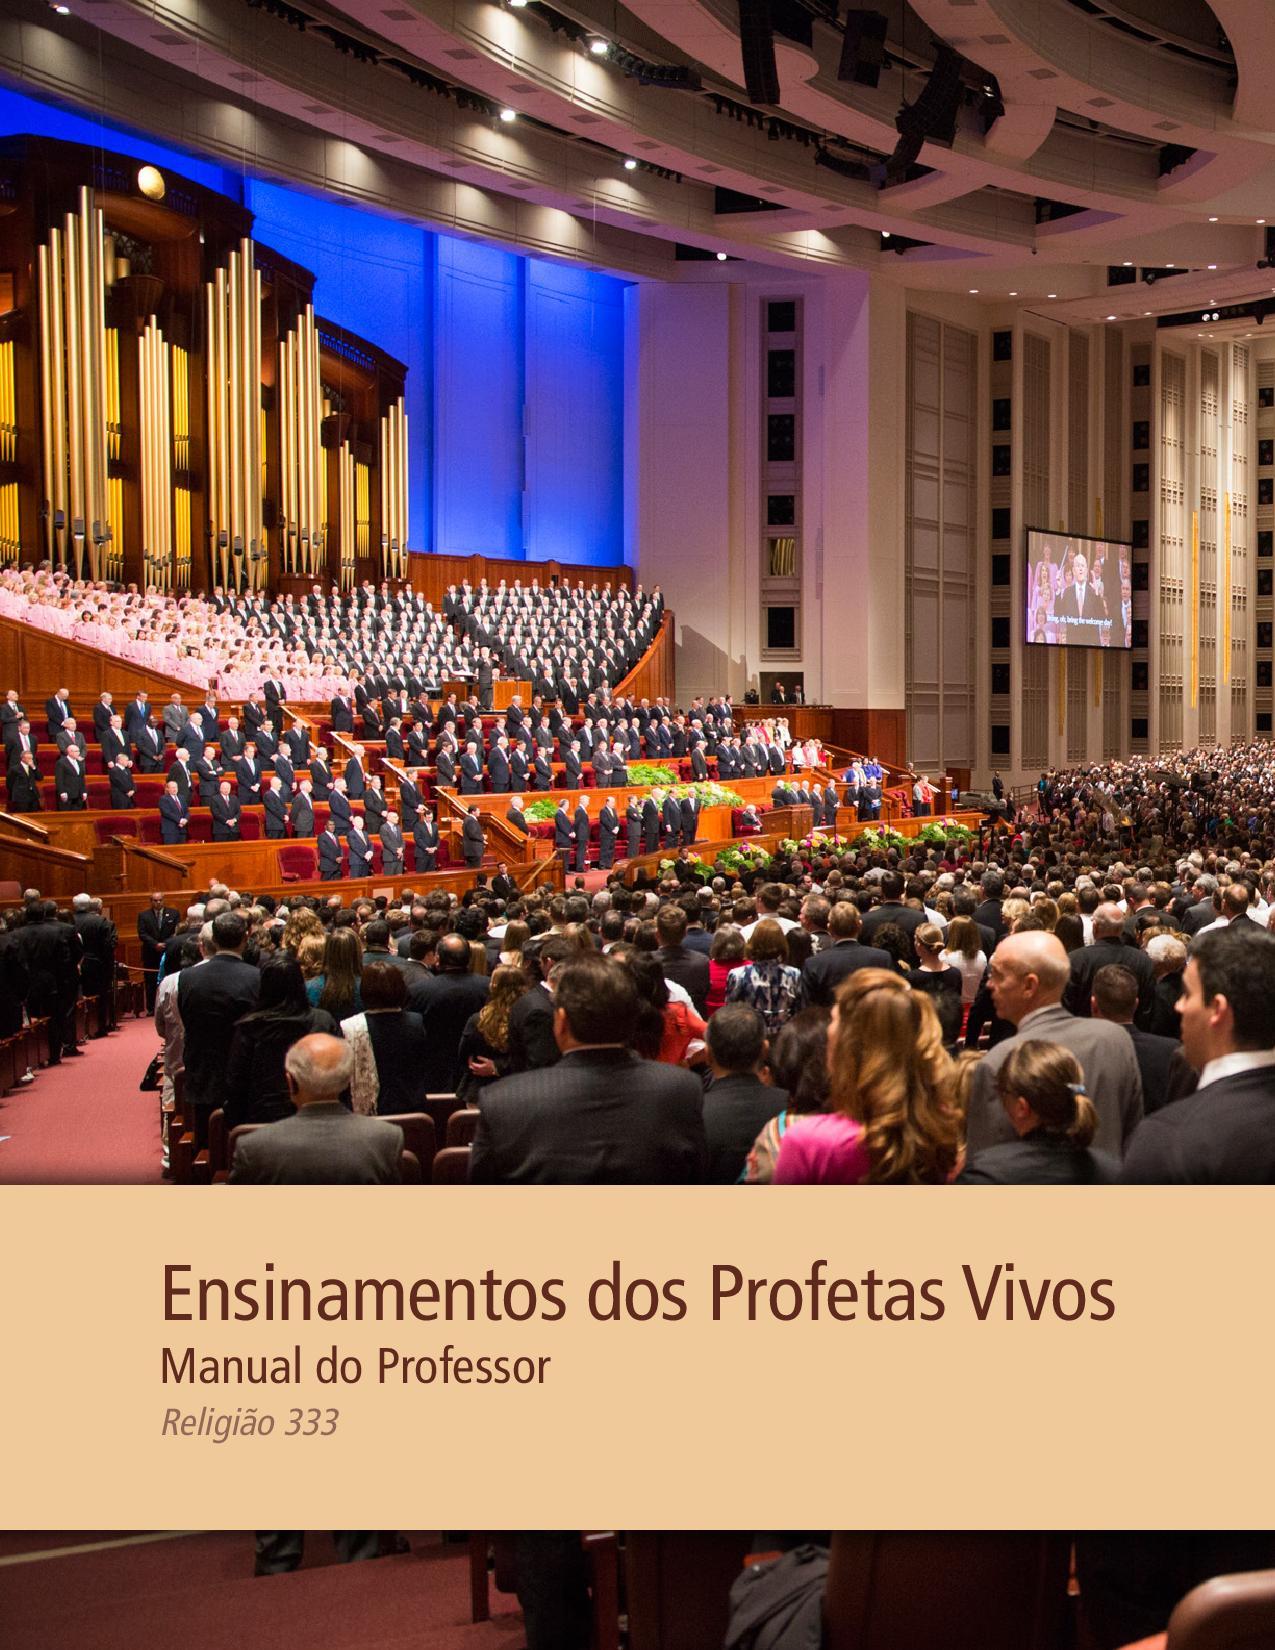 Ensinamentos dos Profetas Vivos — Manual do Professor